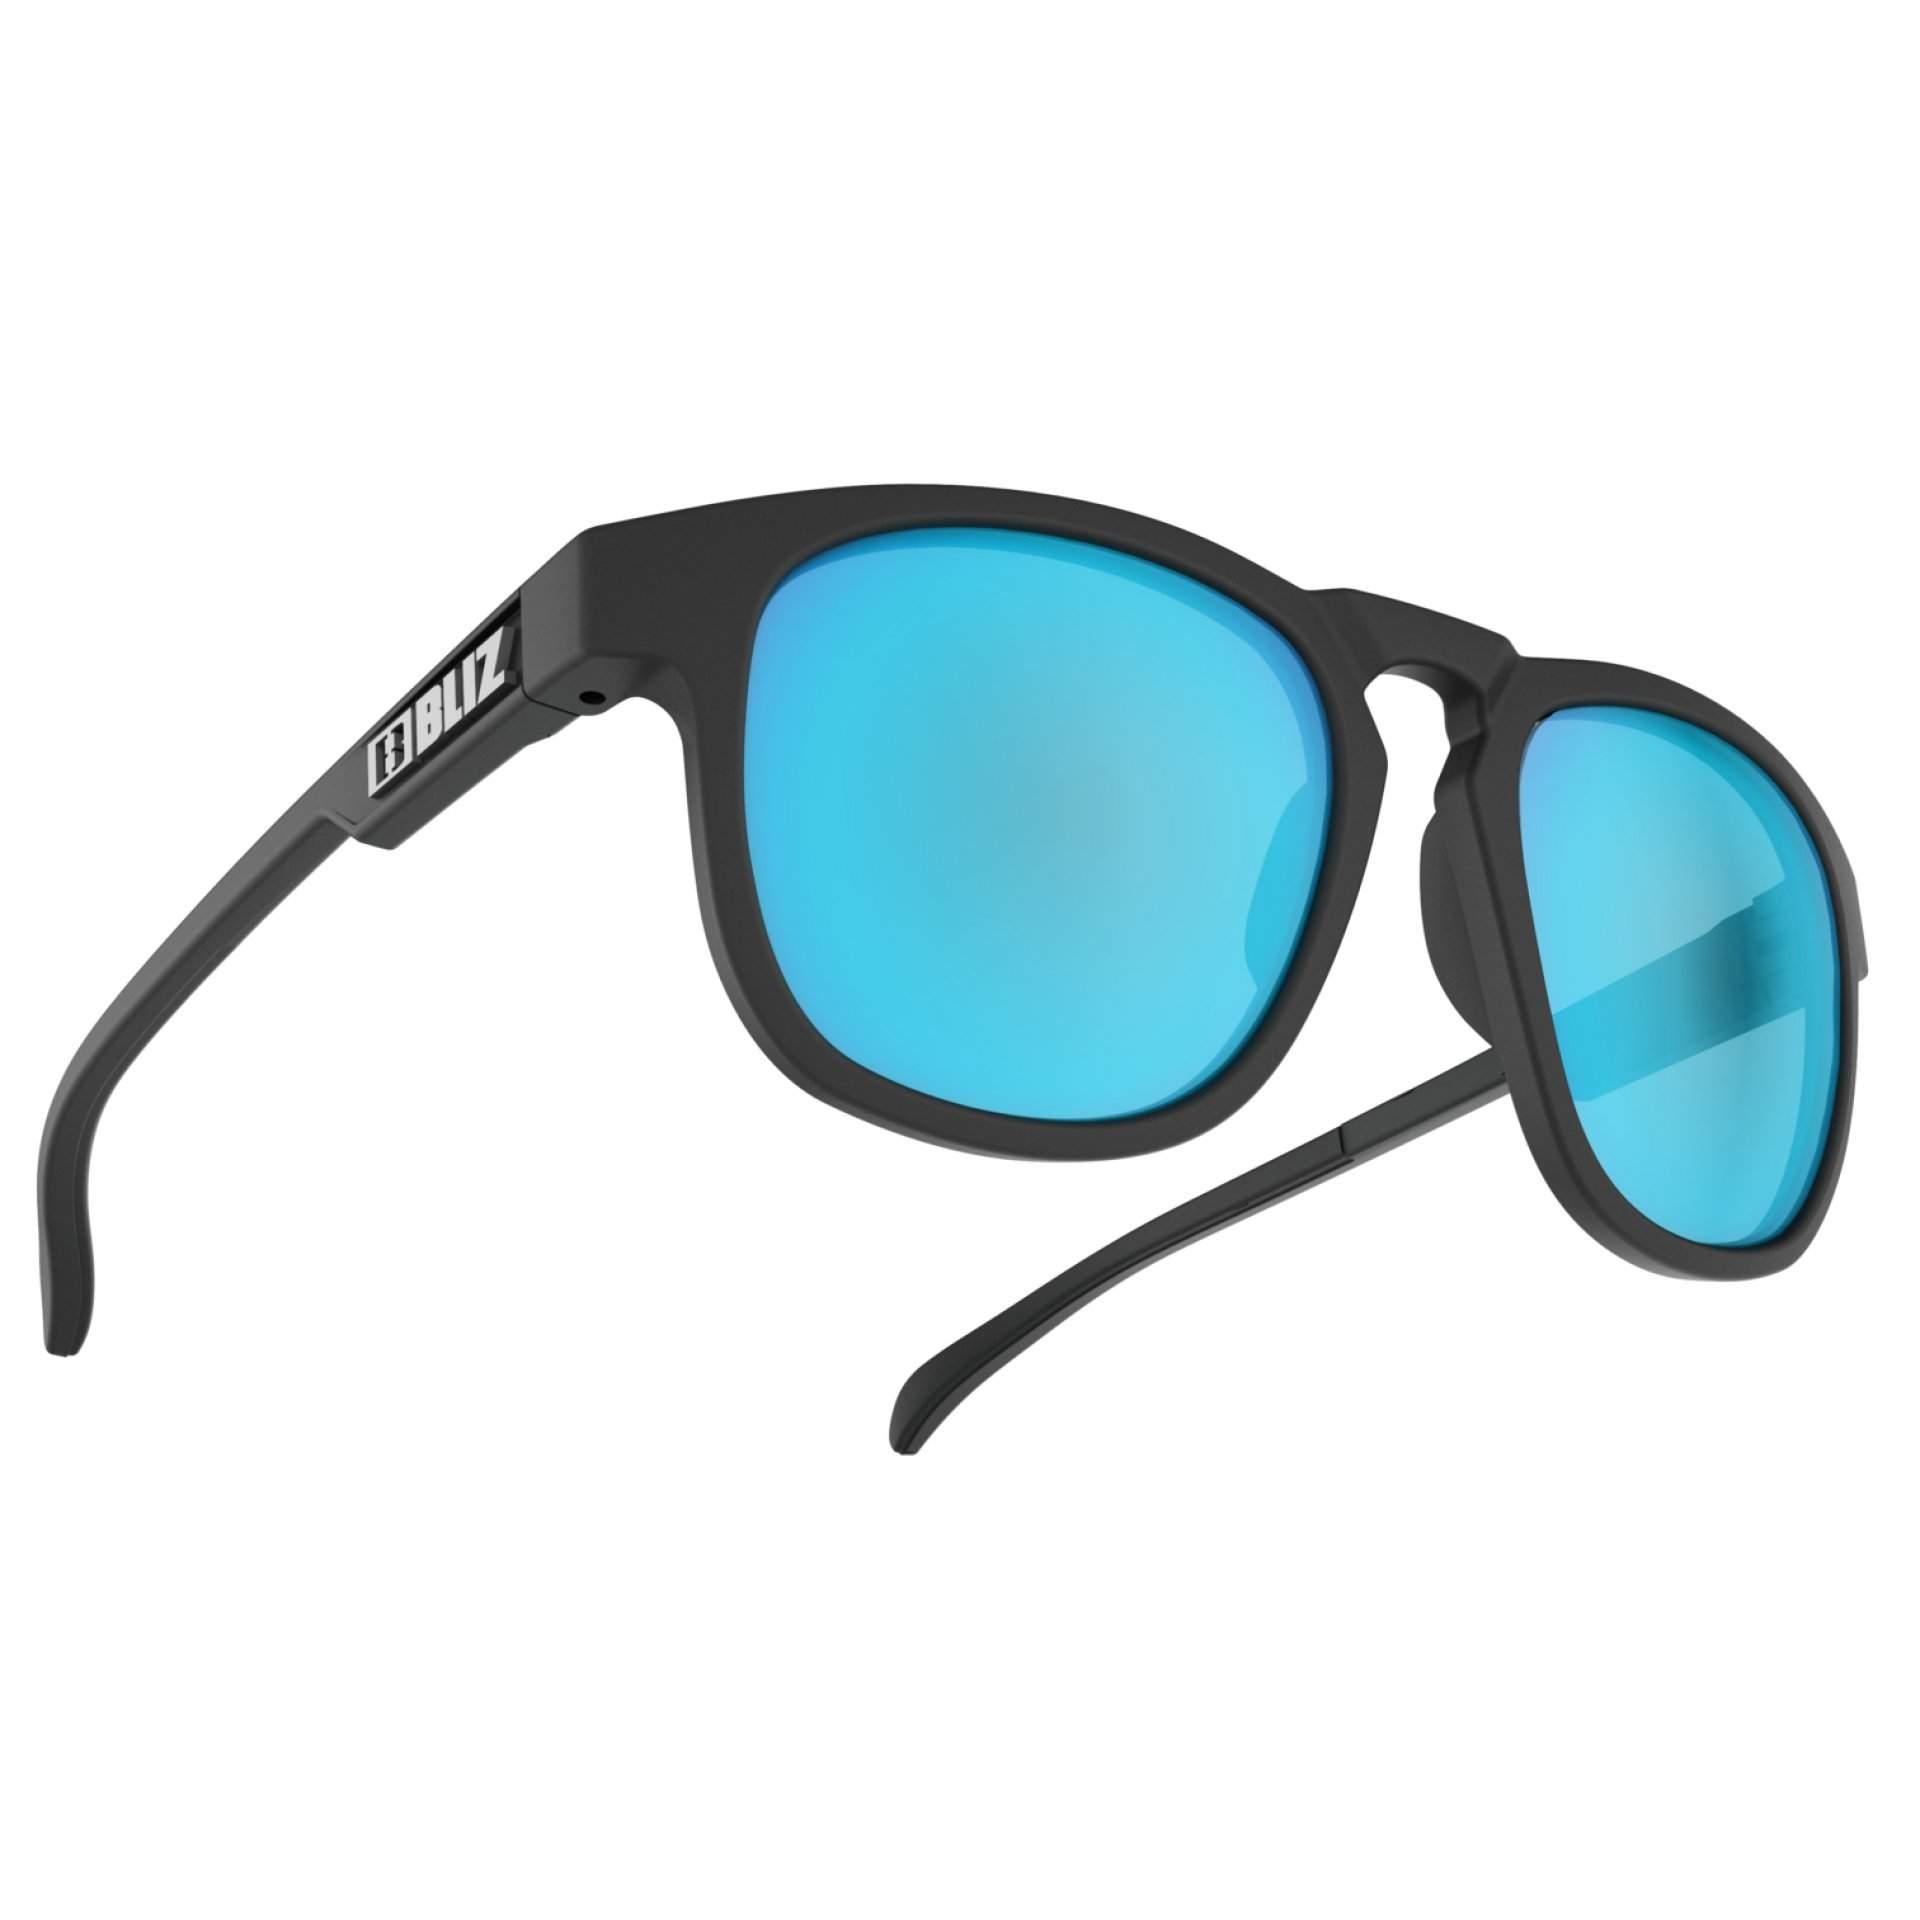 OKULARY BLIZ ACE BLACK SMOKE W BLUE MULTI 54907 13